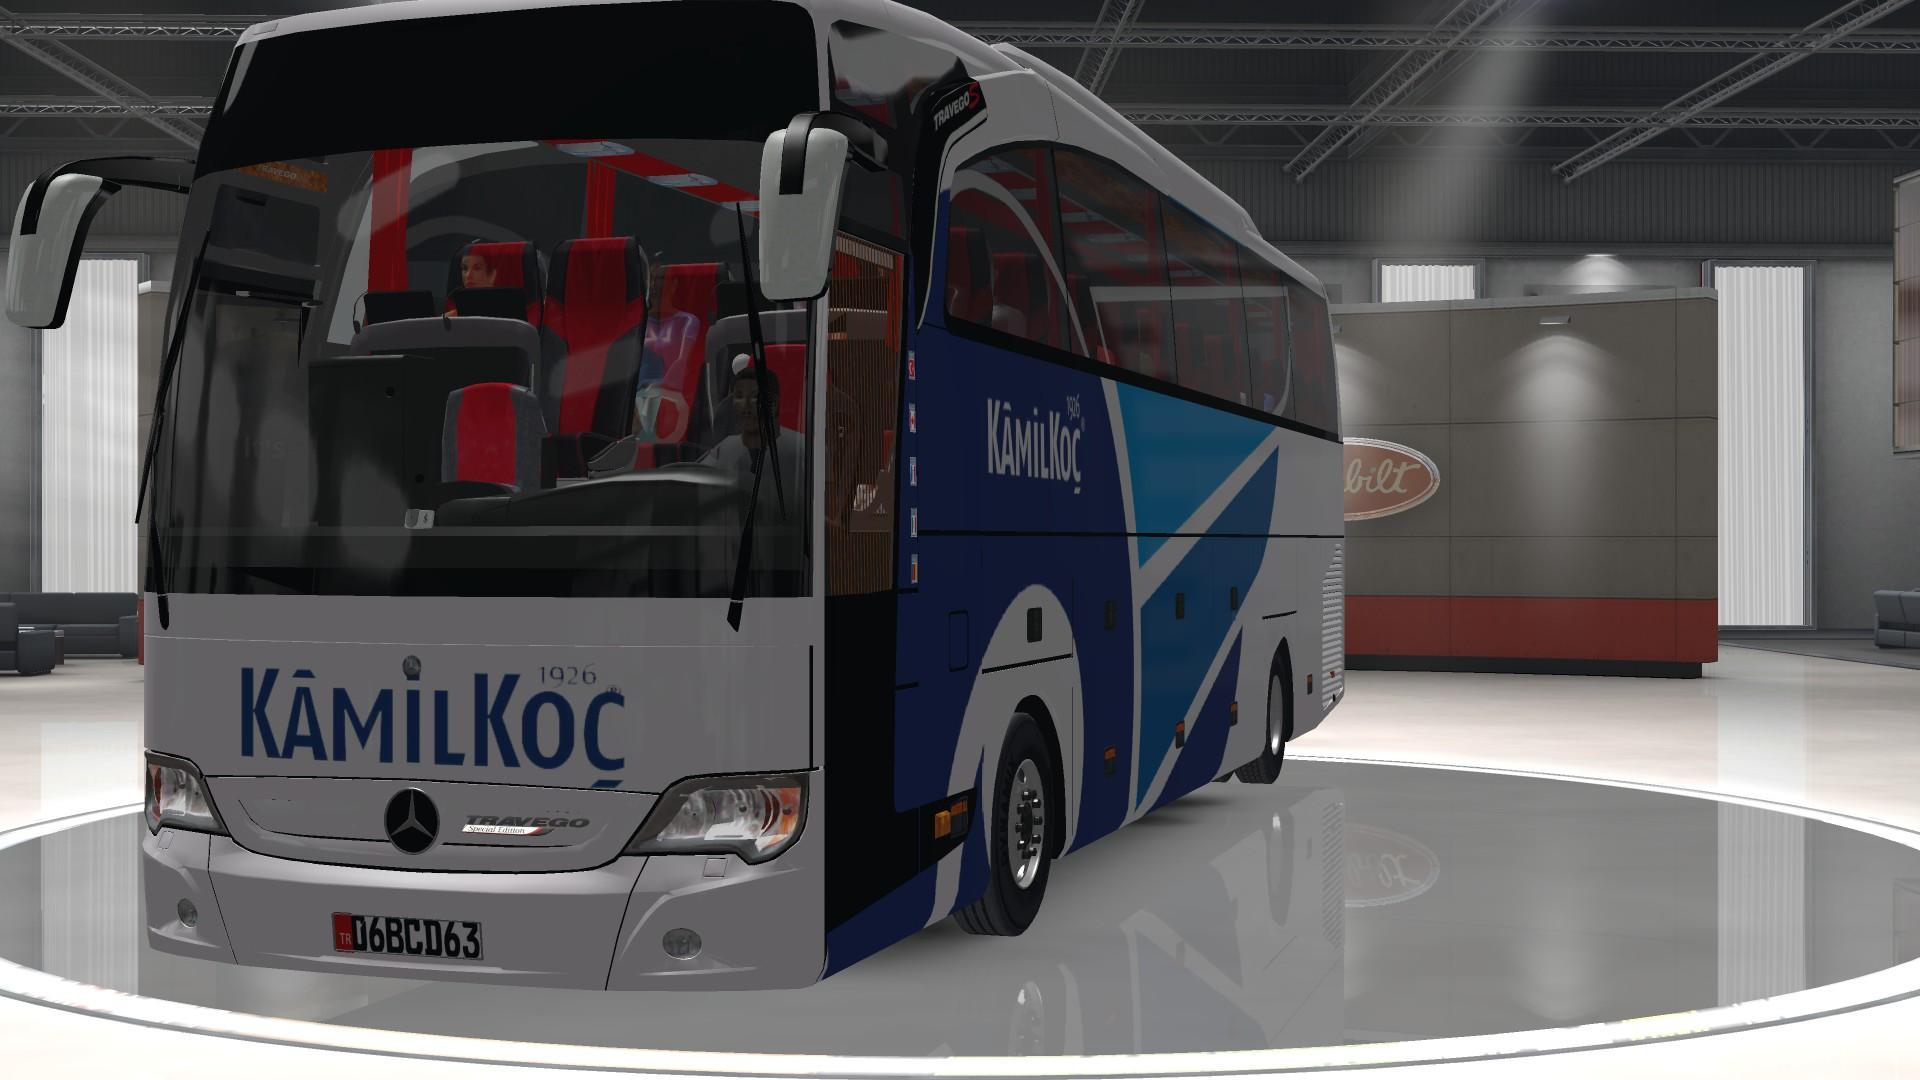 TravegoSHD15 Bus v1 1 0 0 for ATS - ATS Mod | American Truck